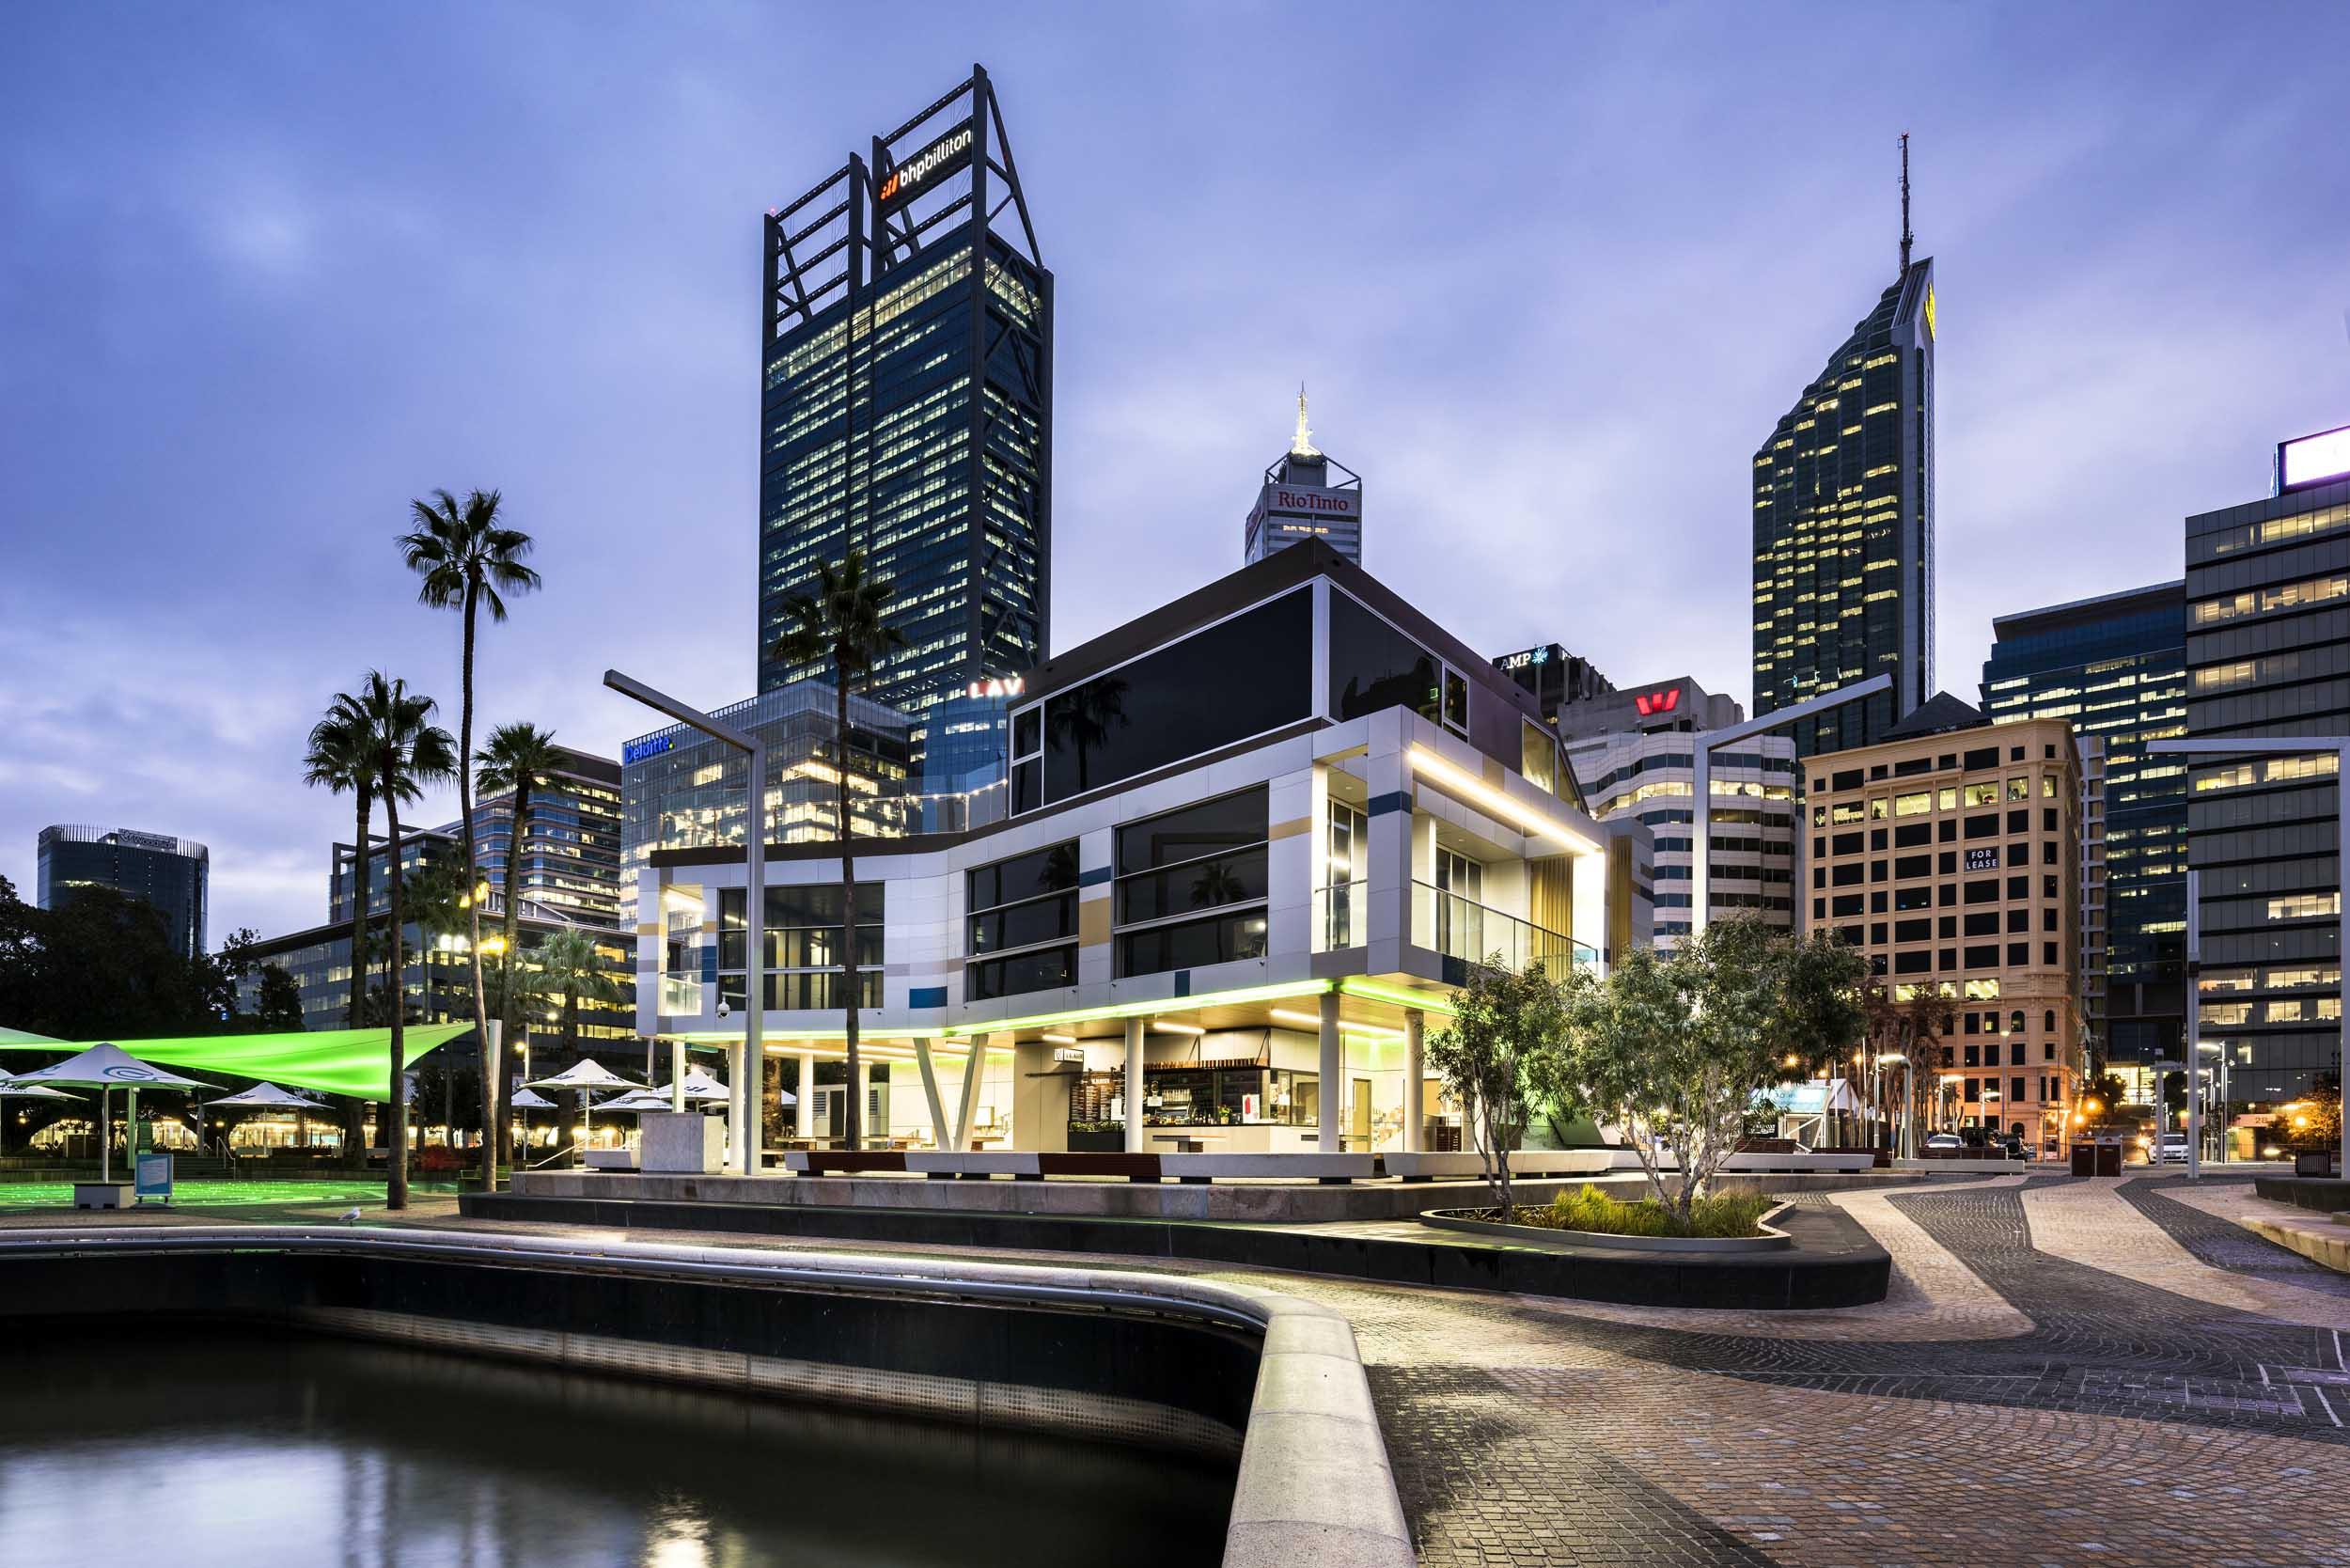 elizabeth-quay-perth-public-food-beverage-outlet-western-australia-architecture-architect-building-design-designer-building-architectural-hero-shot.jpg